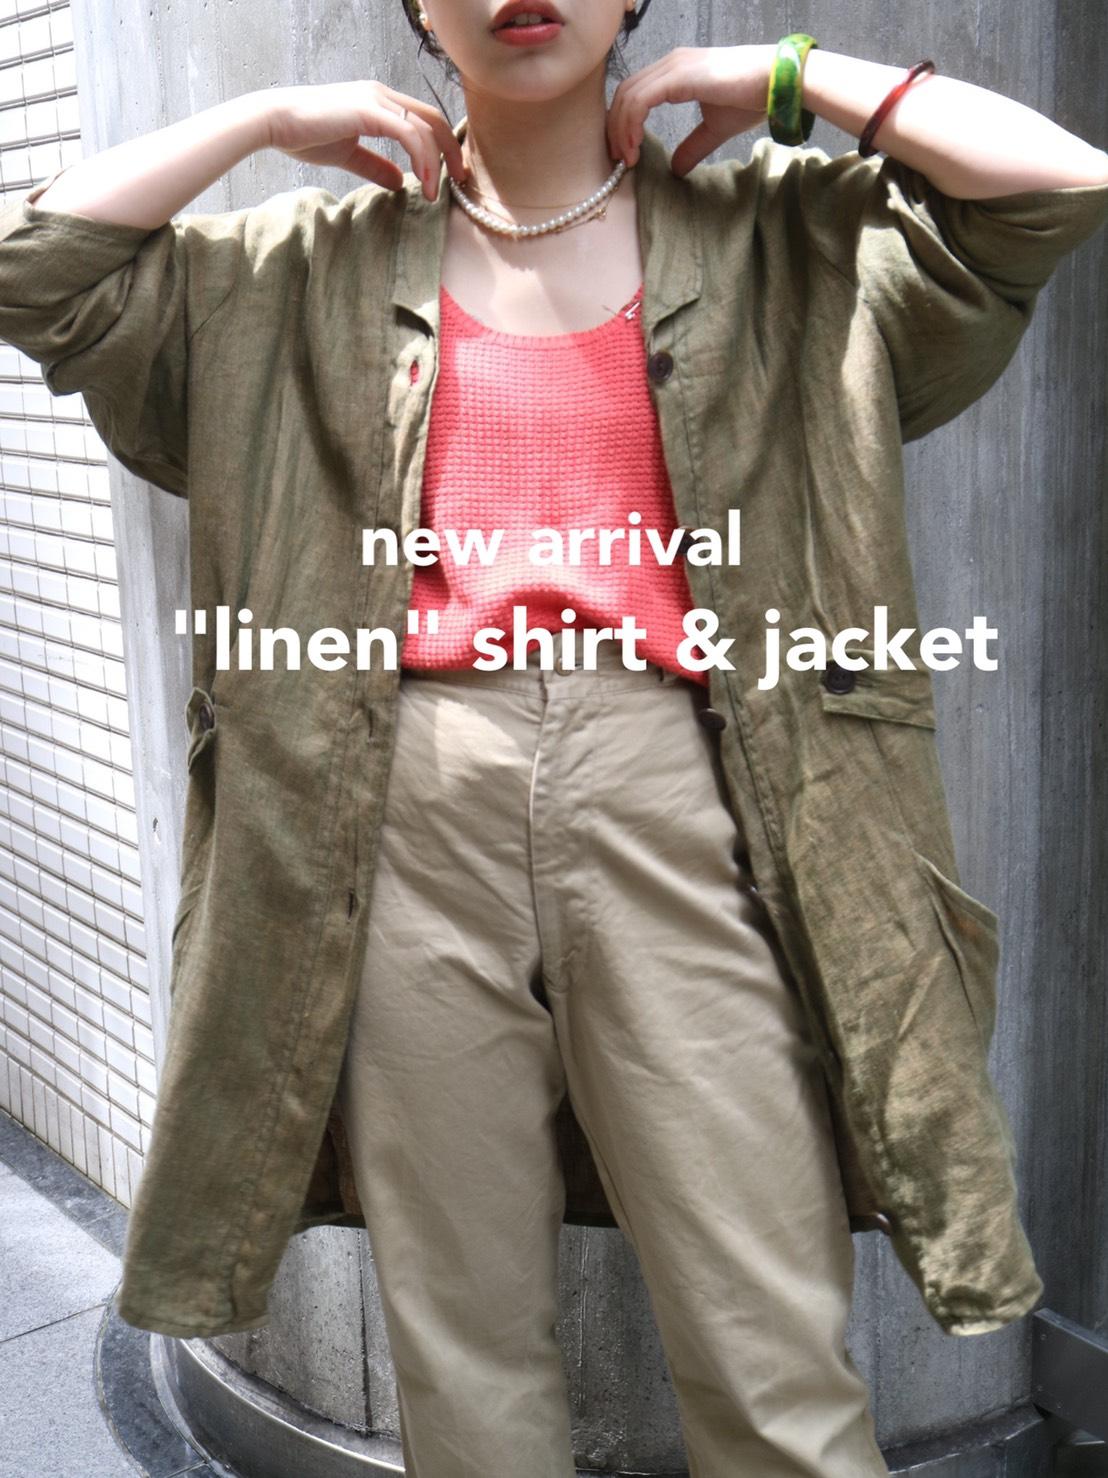 "new arrival ""linen"" shirt & jacket"